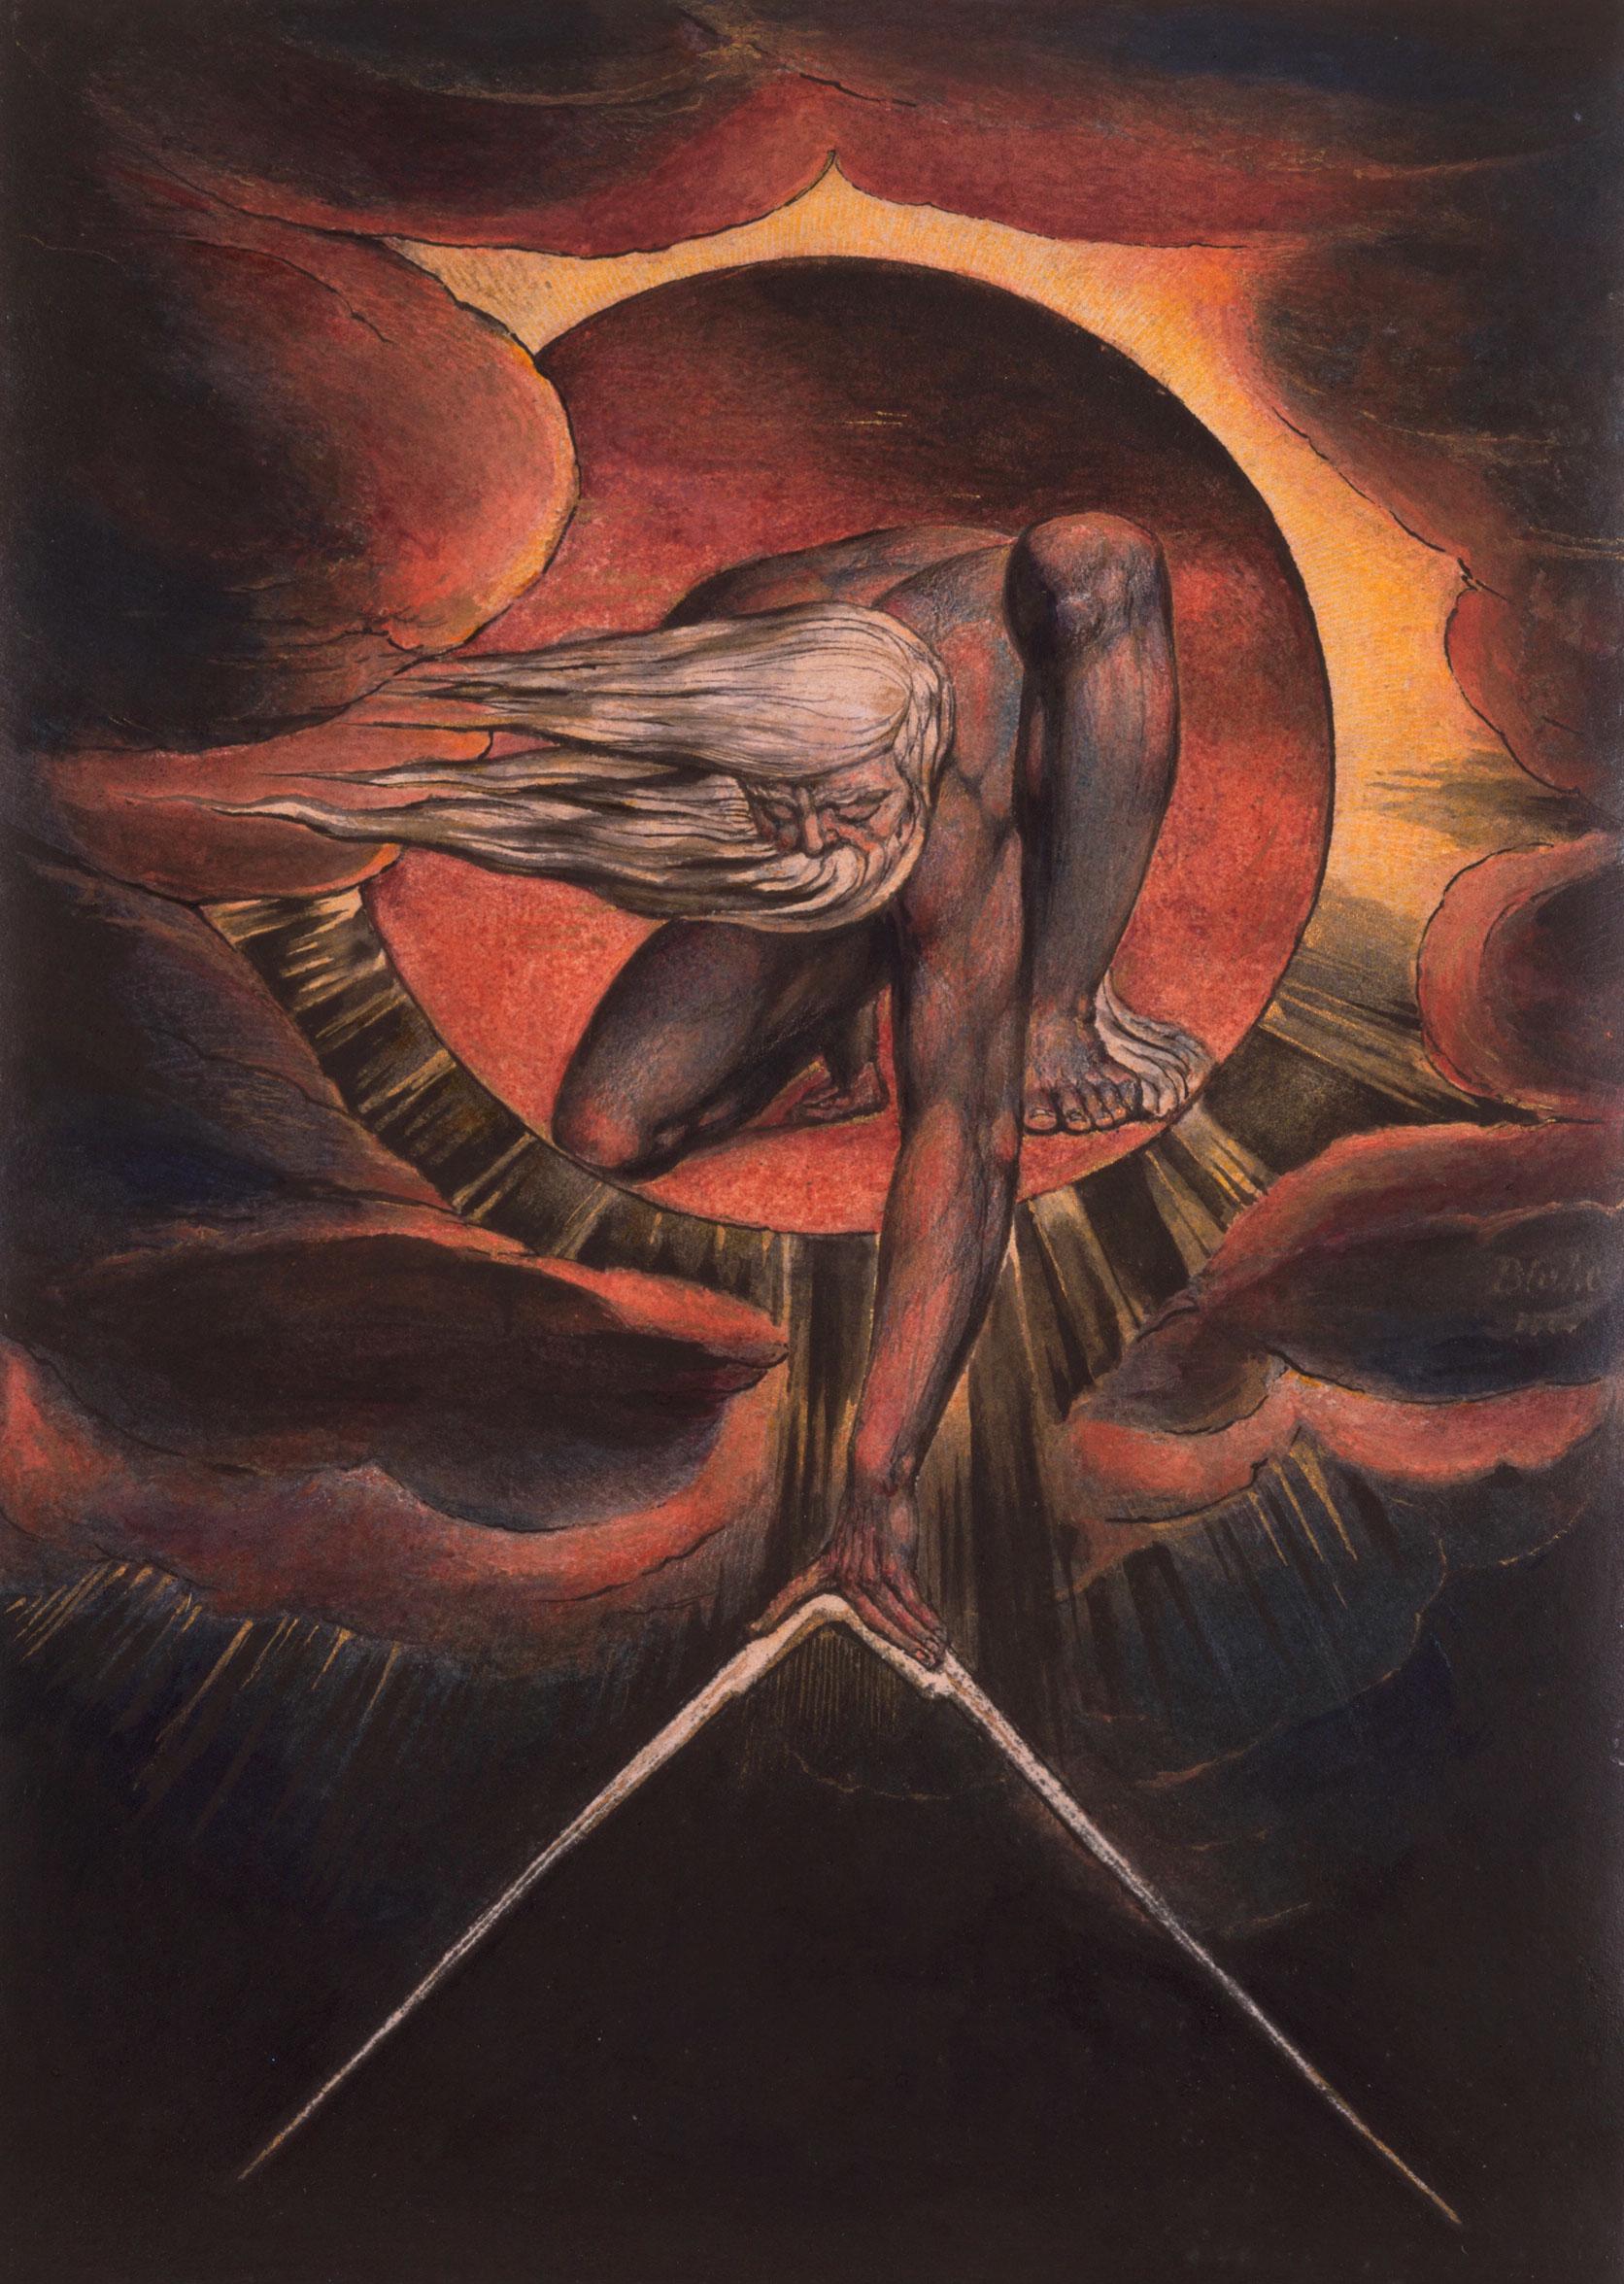 William Blake, 'The Ancient of Days', frontespizio di 'Europe' (1827)